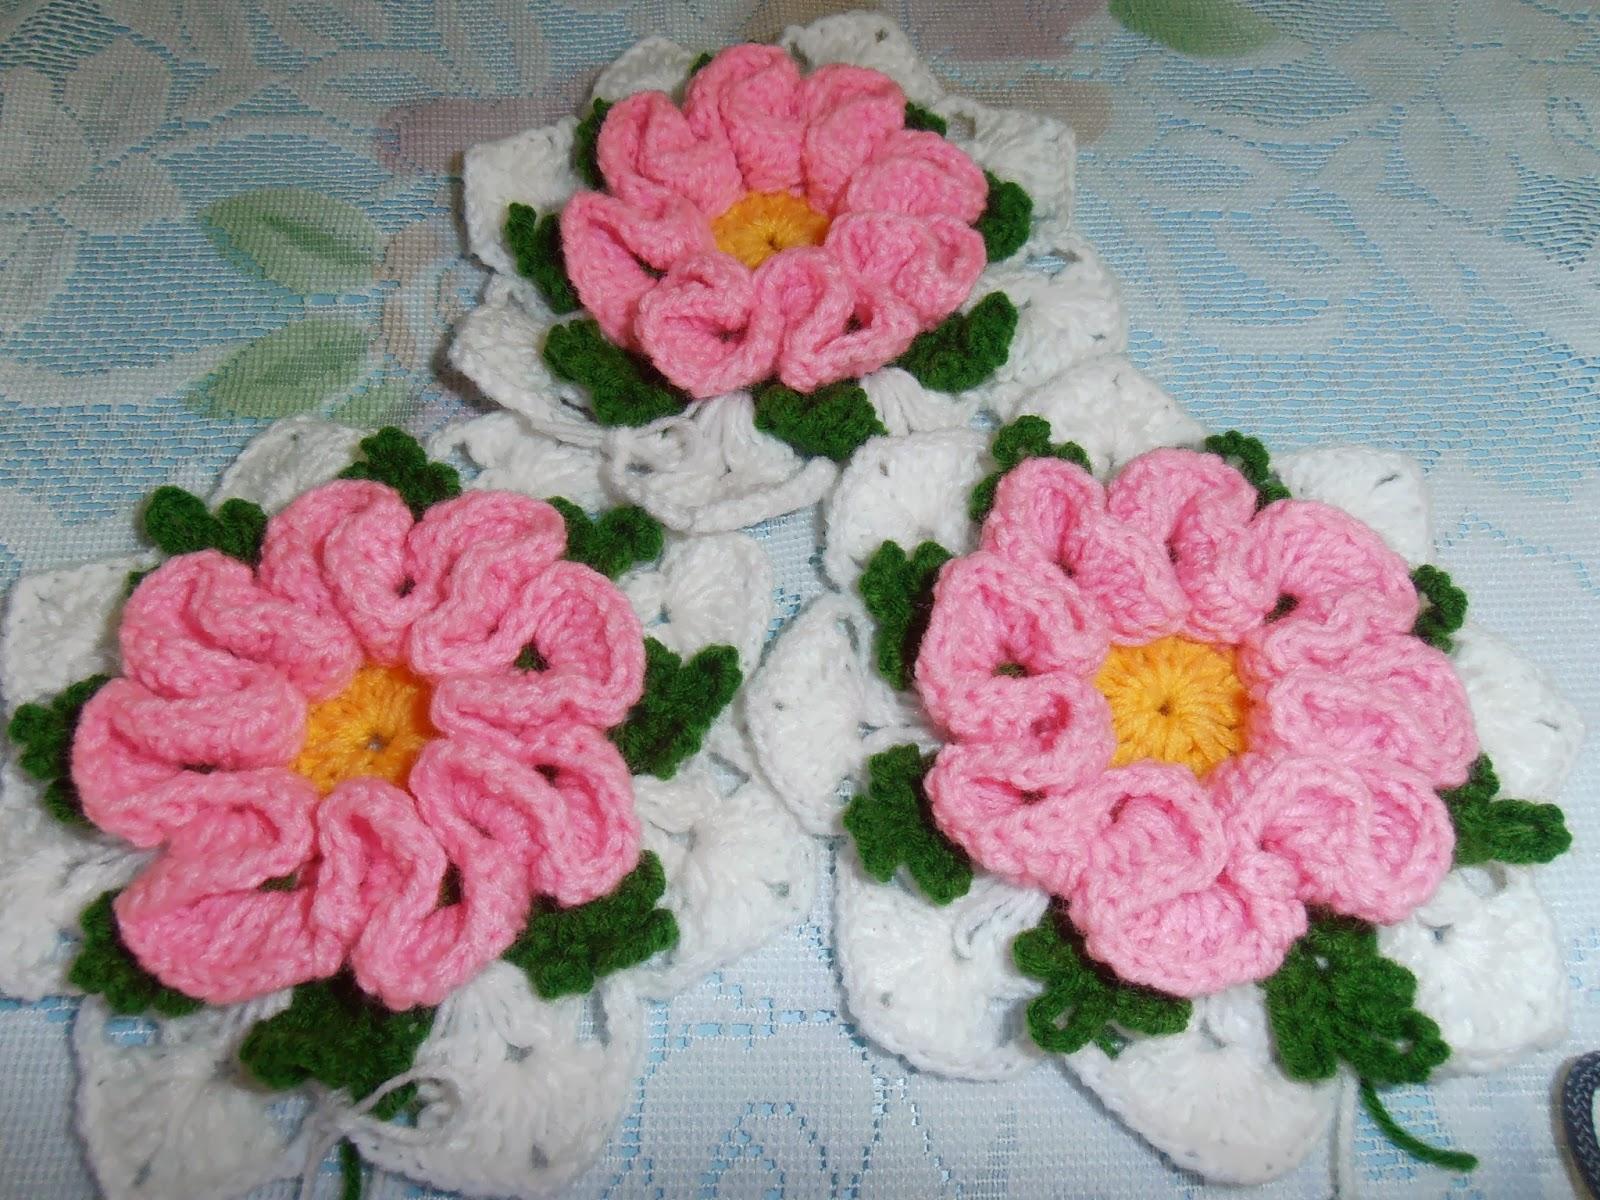 Dielas crochet crocet bunga camelia pink kali ini saya kaitkan bunga camelia berwarna pink pula tetapi masih belum tahu lagi nak buat projek apa memandangkan benang berwarna hijau kehabisan stok ccuart Gallery